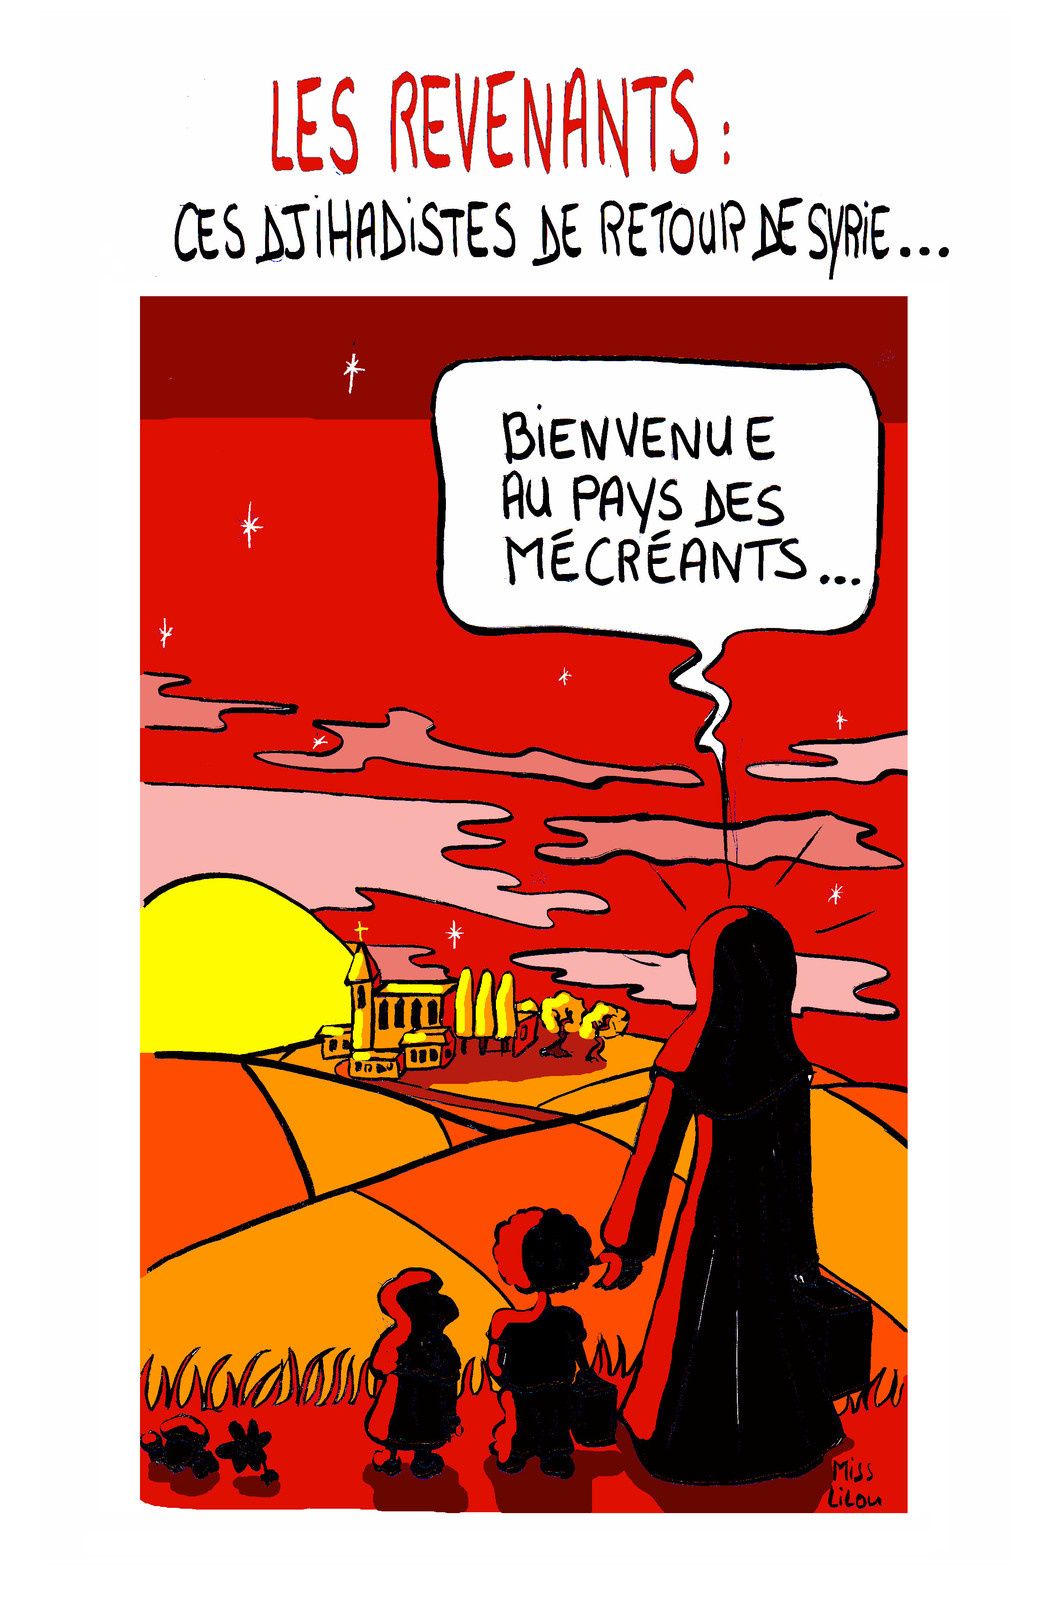 dessin humoristique d'une djihadiste qui rentre en France avec ses deux enfants